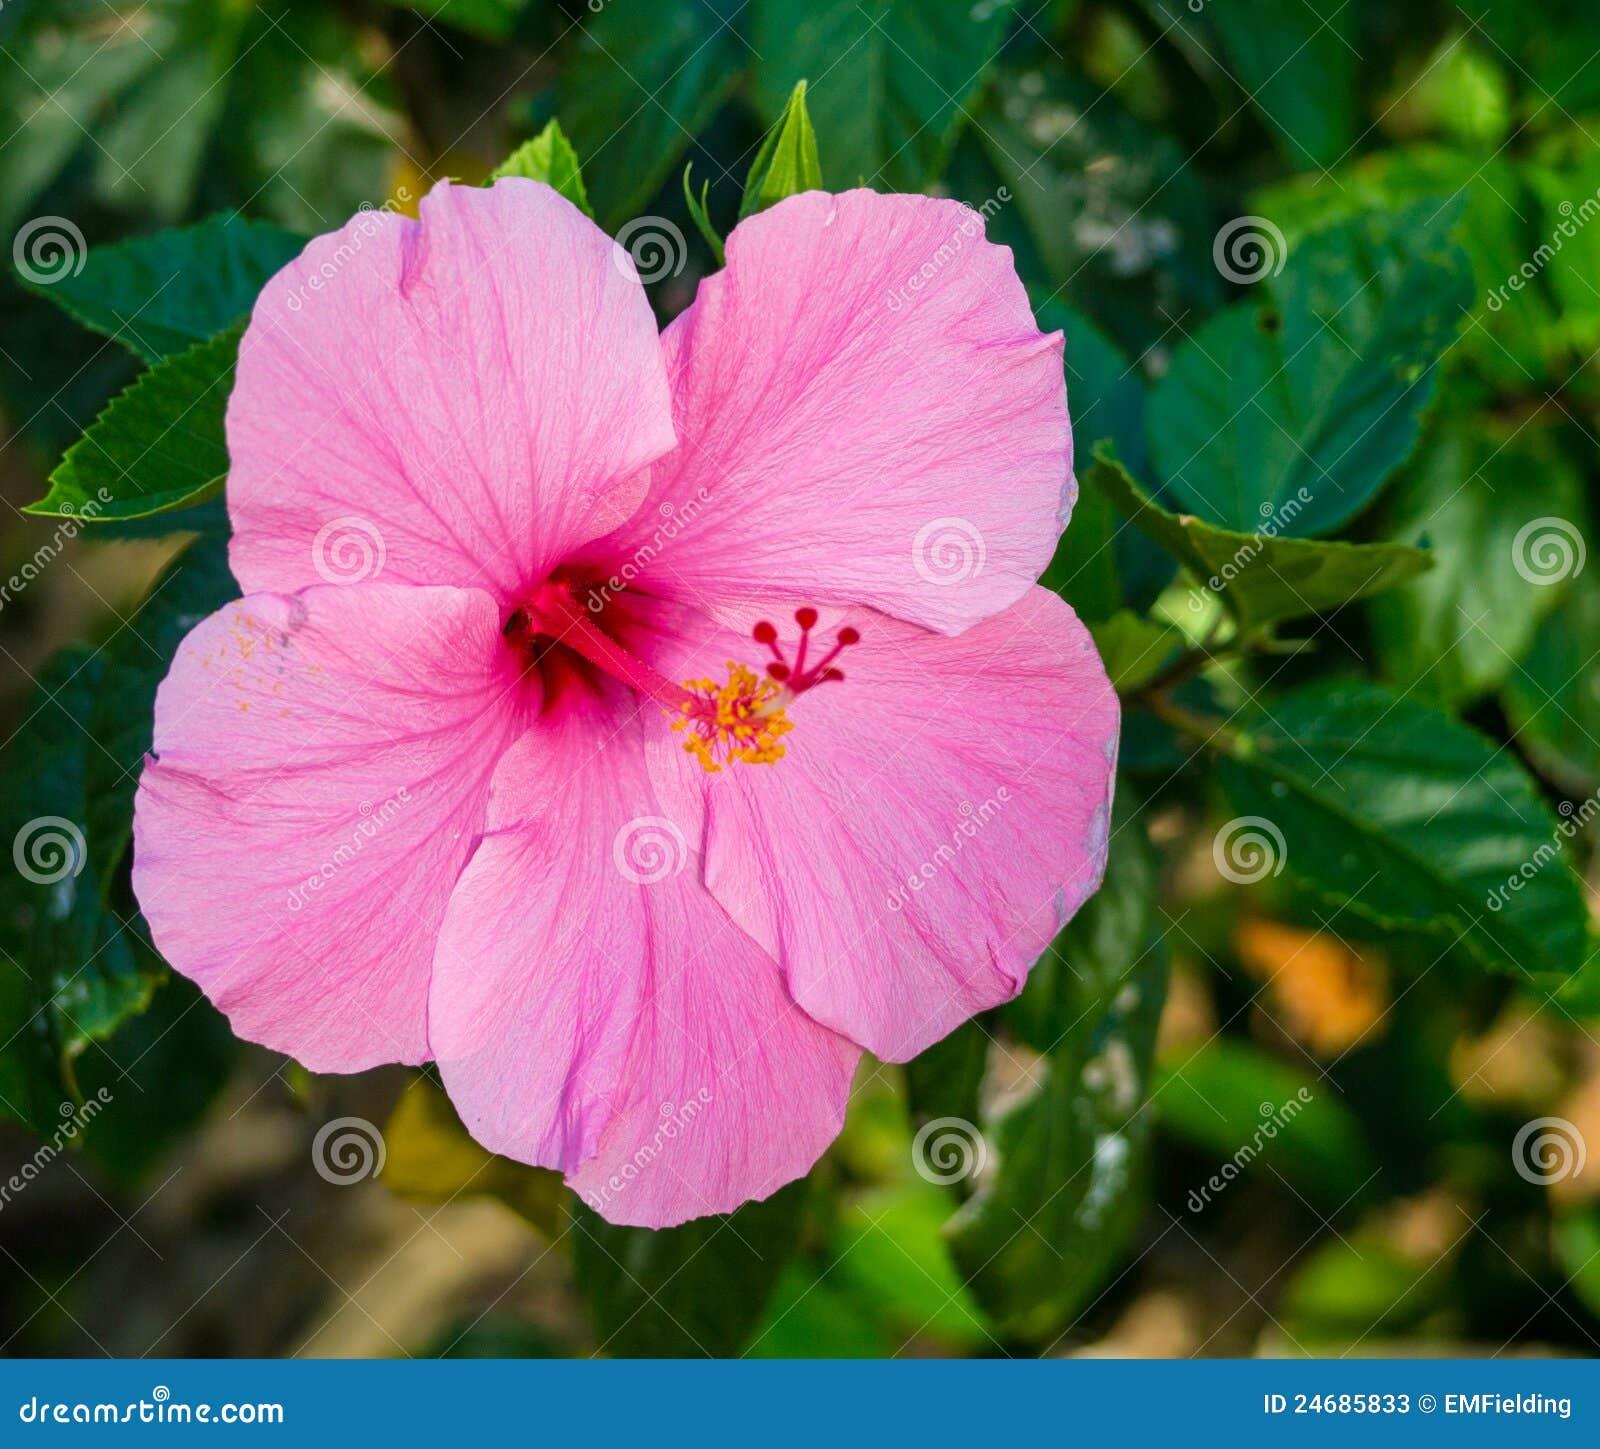 Pink hibiscus flower stock image image of botanical 24685833 pink hibiscus flower izmirmasajfo